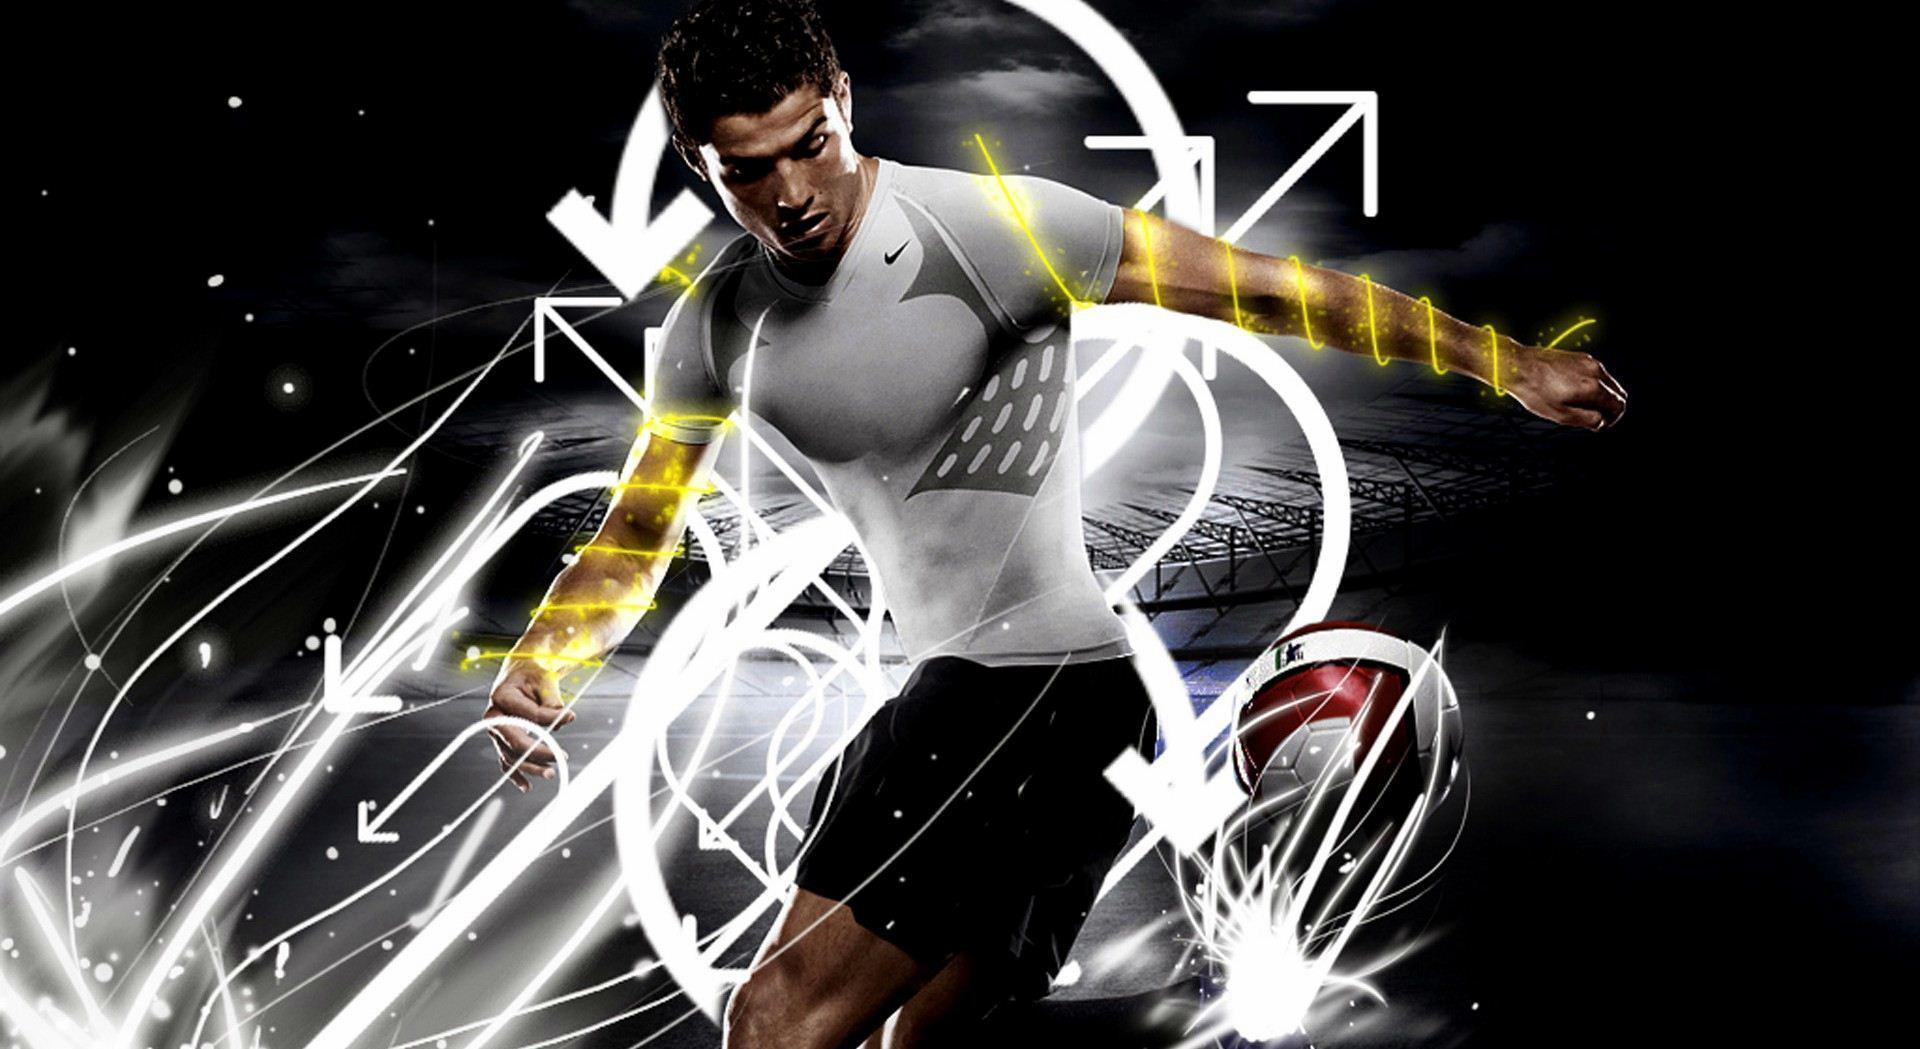 Cristiano Ronaldo Wallpapers 2015 Nike - Wallpaper Cave